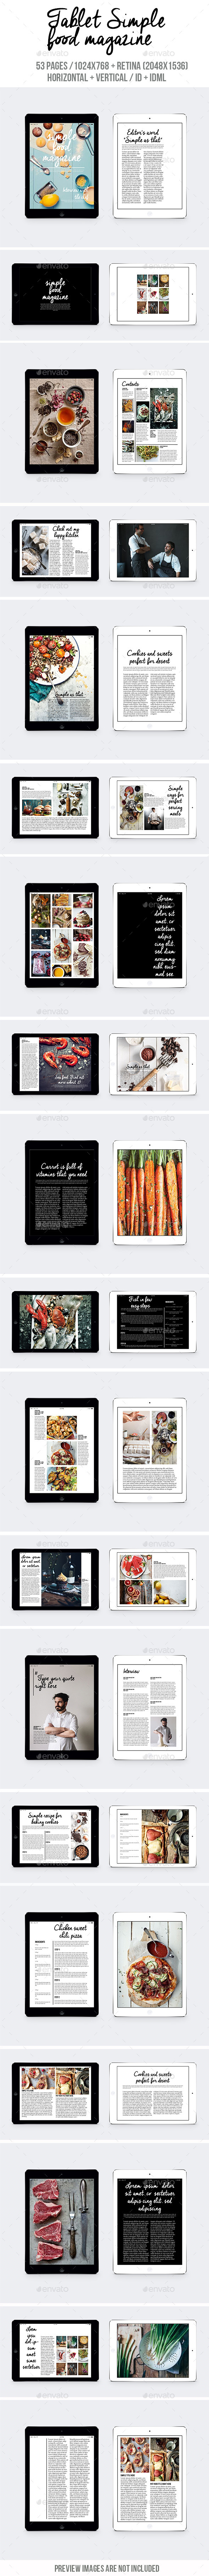 Tablet Simple Food Magazine - Digital Magazines ePublishing